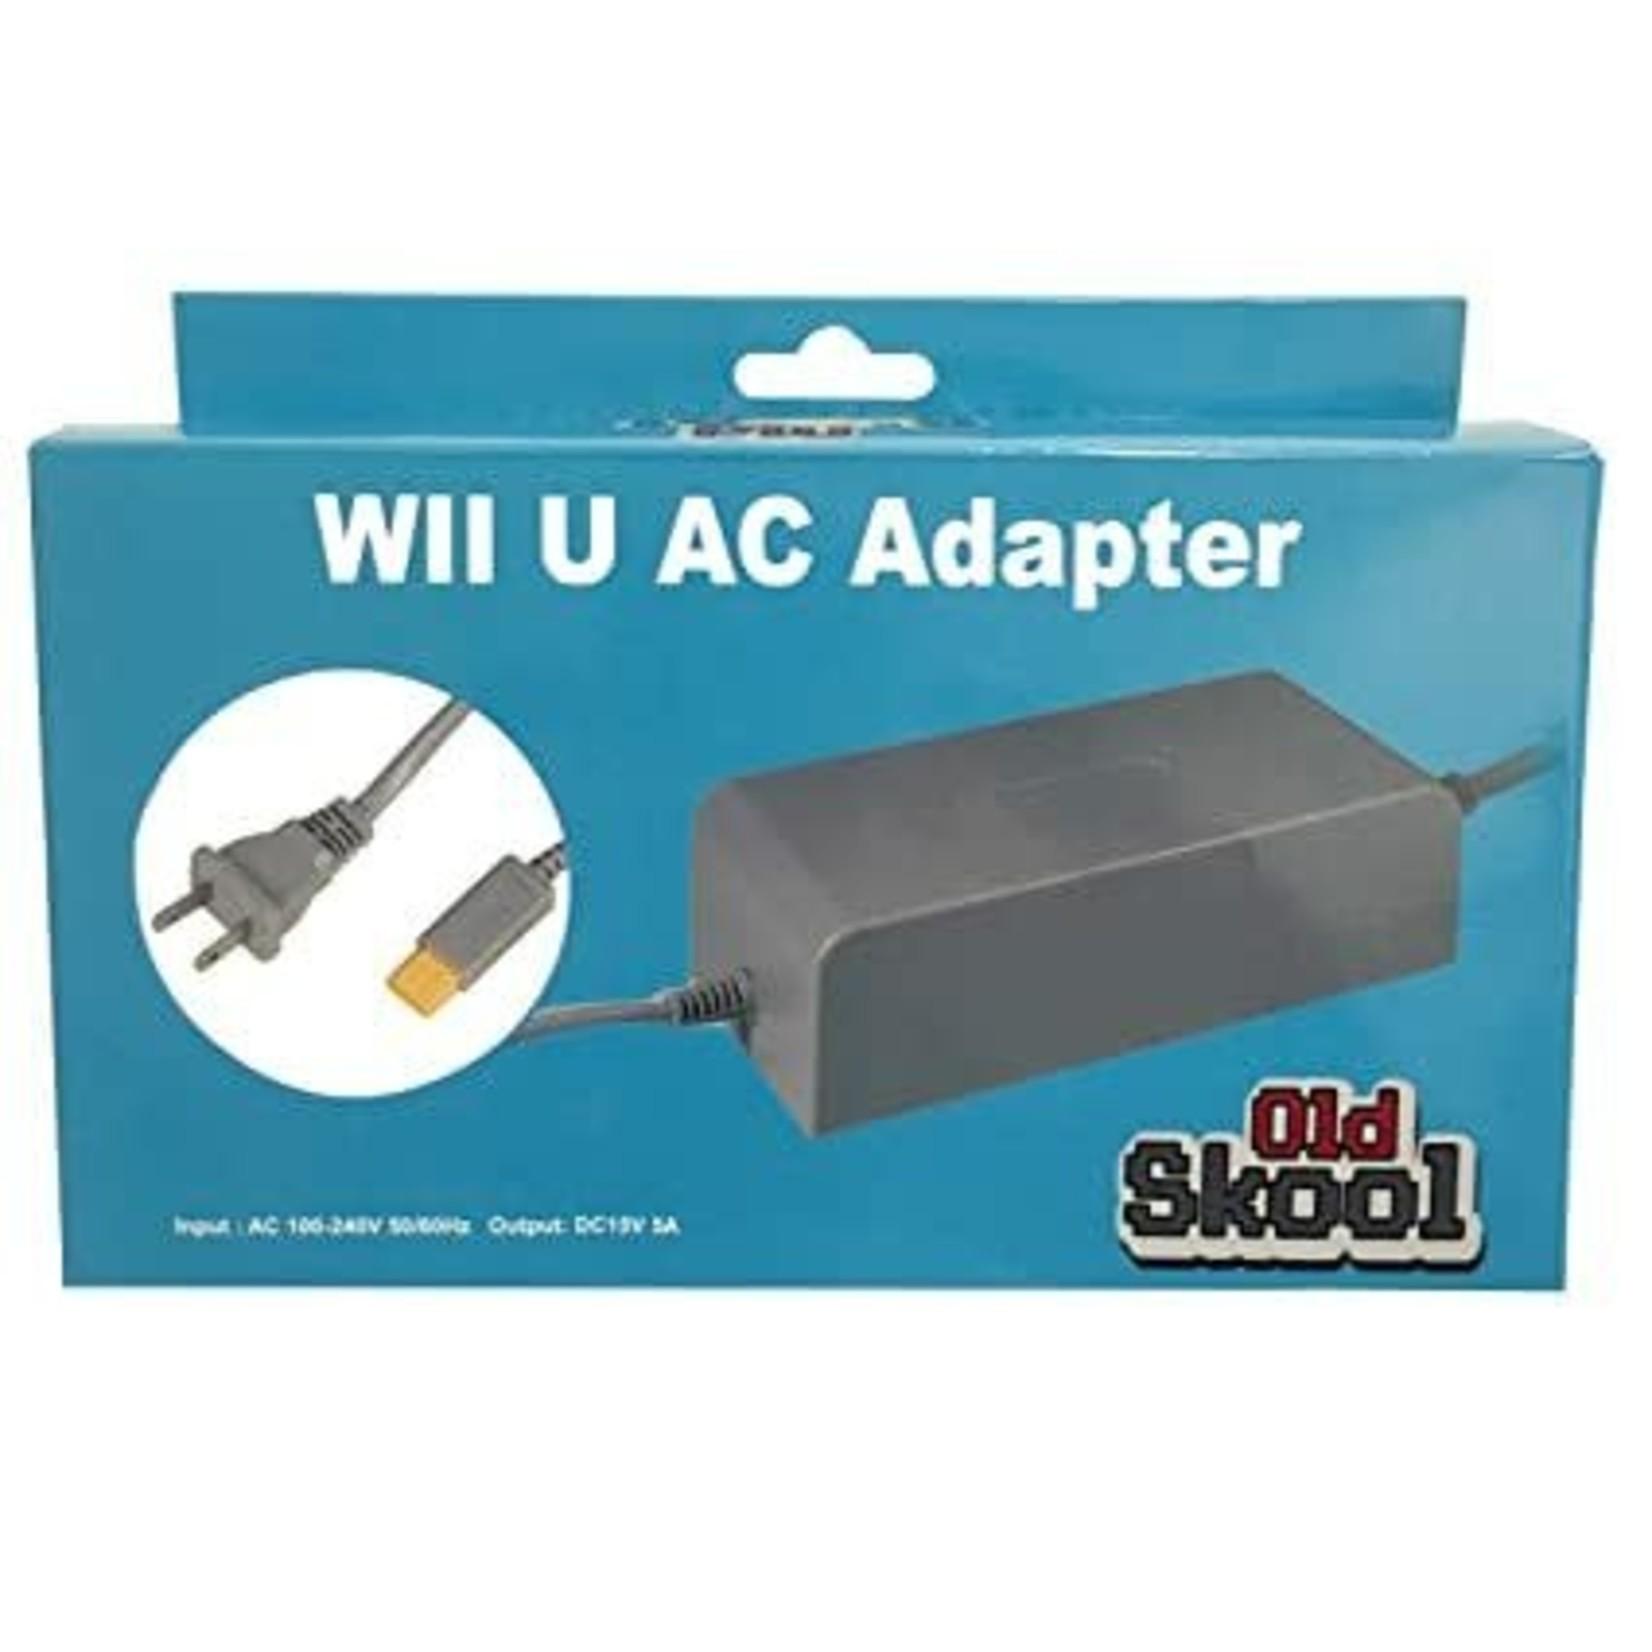 Old skool Wii U Ac Adapter